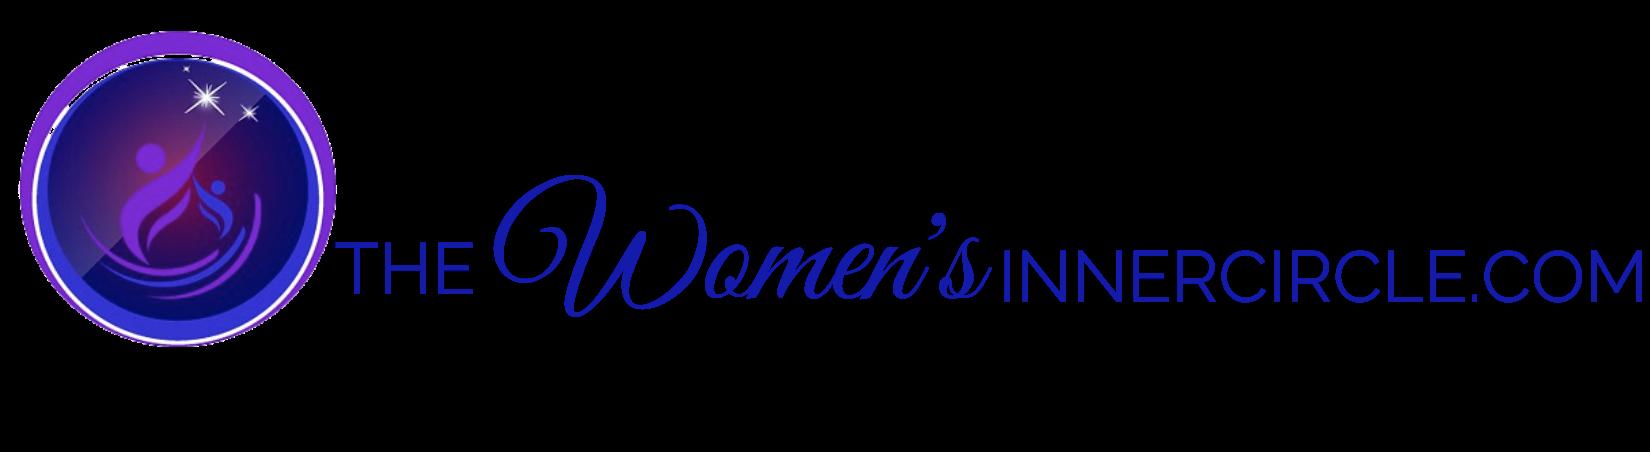 The Women's Inner Circle